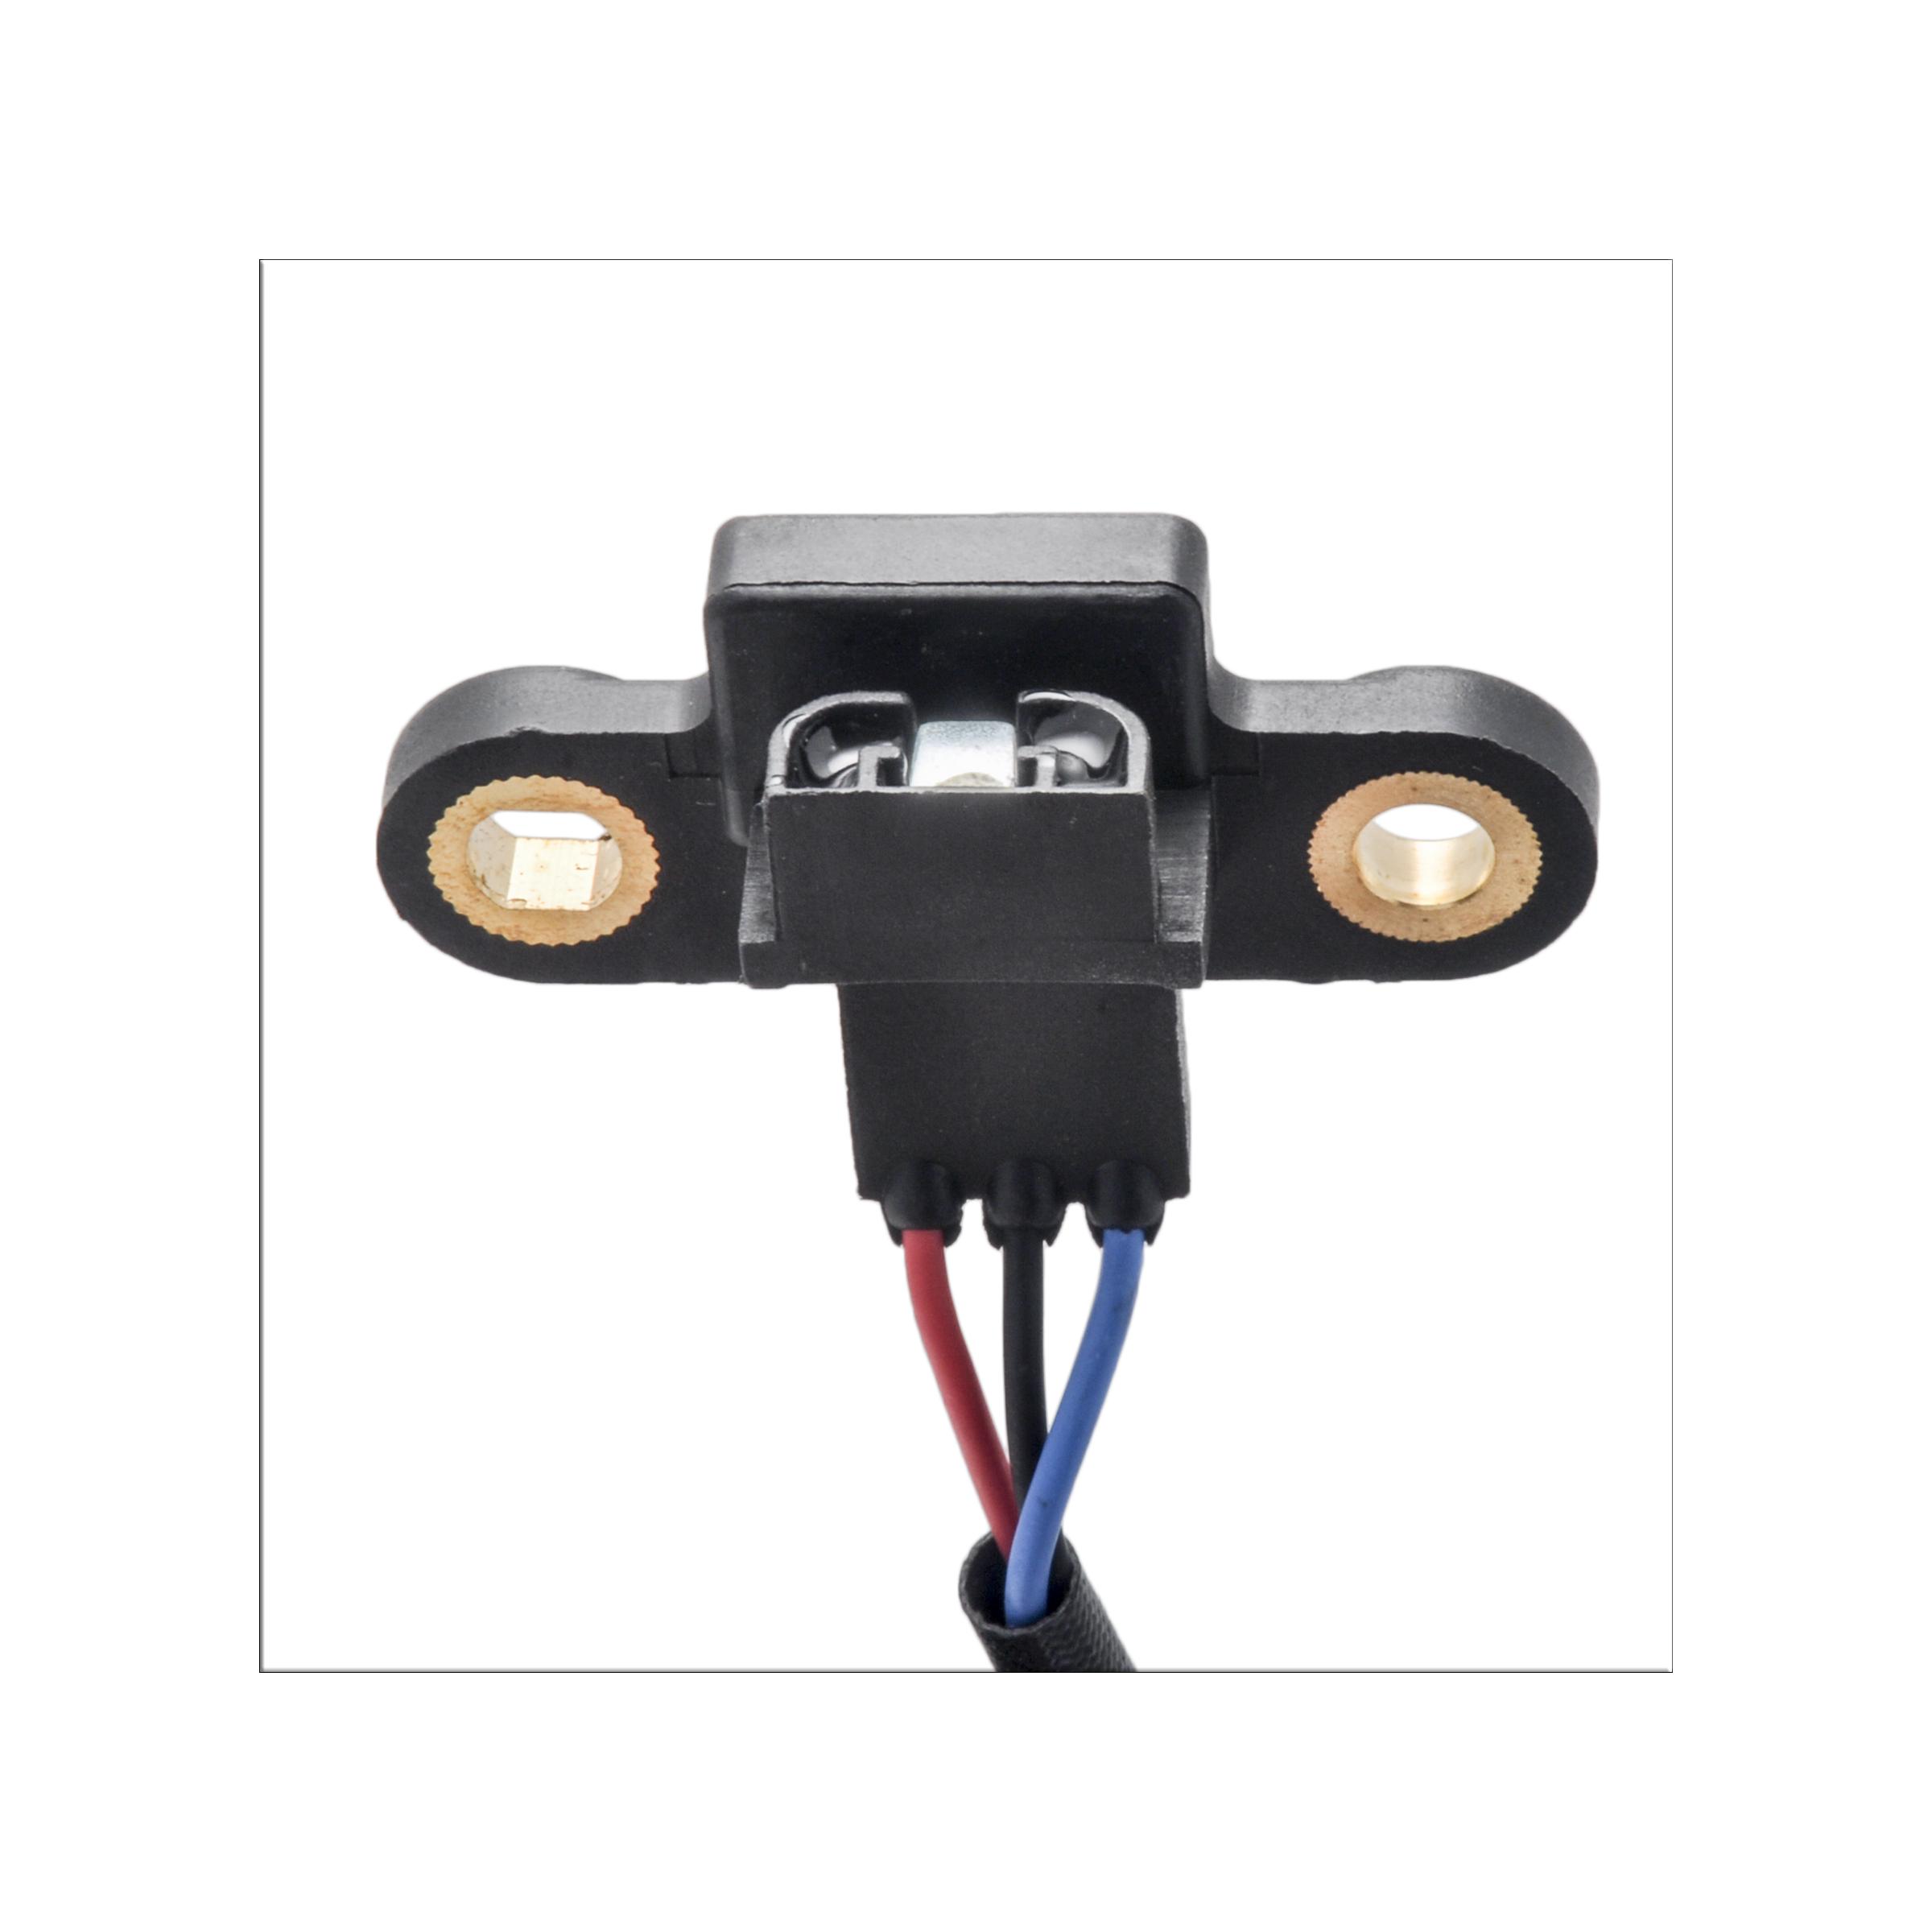 New Herko Crankshaft Position Sensor CKP2055 For Hyundai